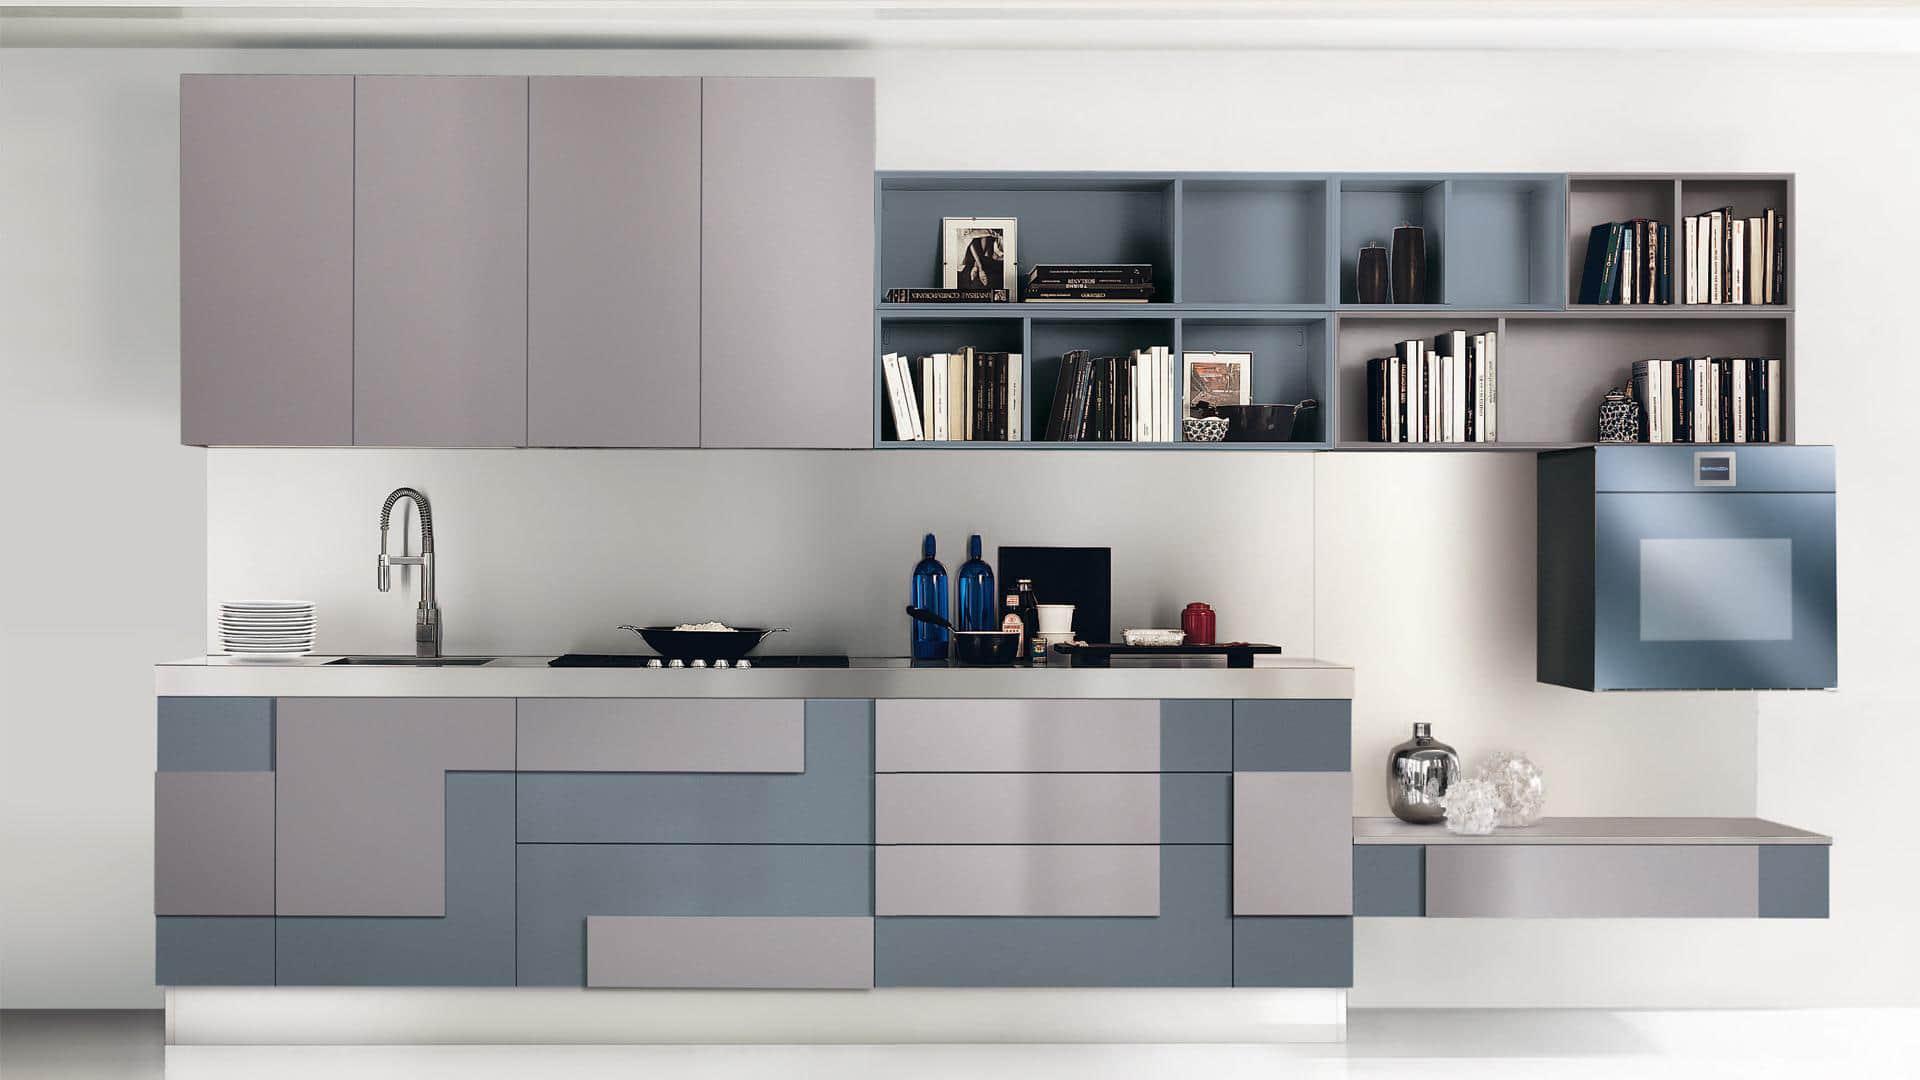 Cucine lineari moderne padova anche in offerta for Cucine moderne lube